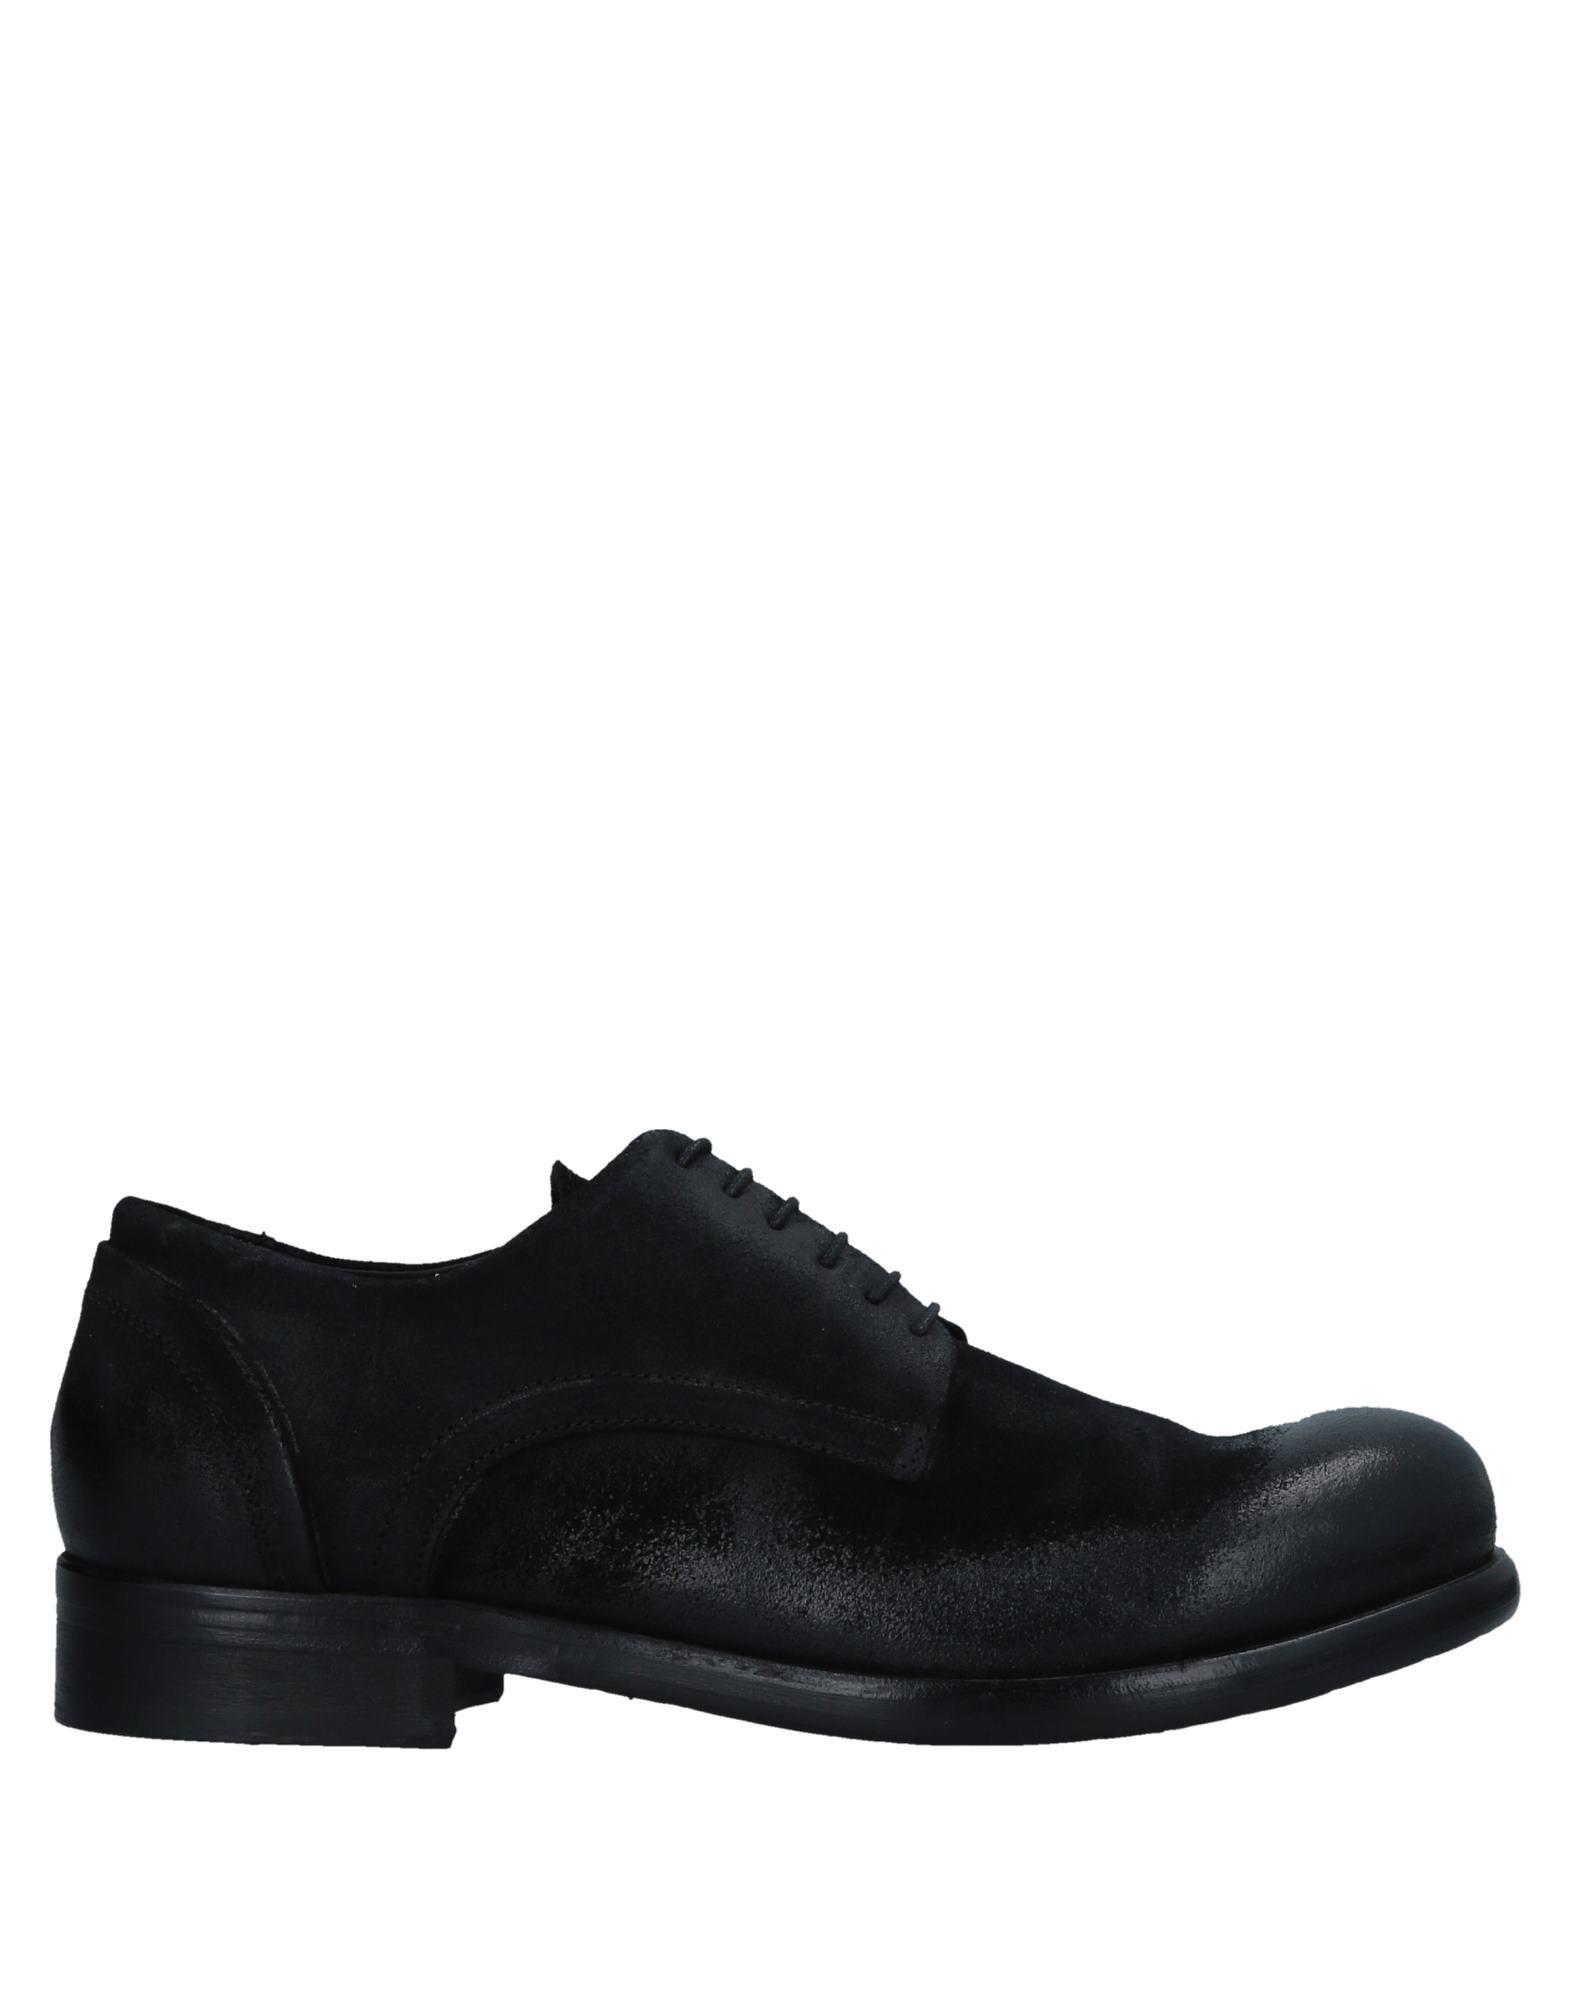 Calzoleria Napoletana  1921 Schnürschuhe Schnürschuhe Schnürschuhe Herren  11527049DG Gute Qualität beliebte Schuhe ef26e6